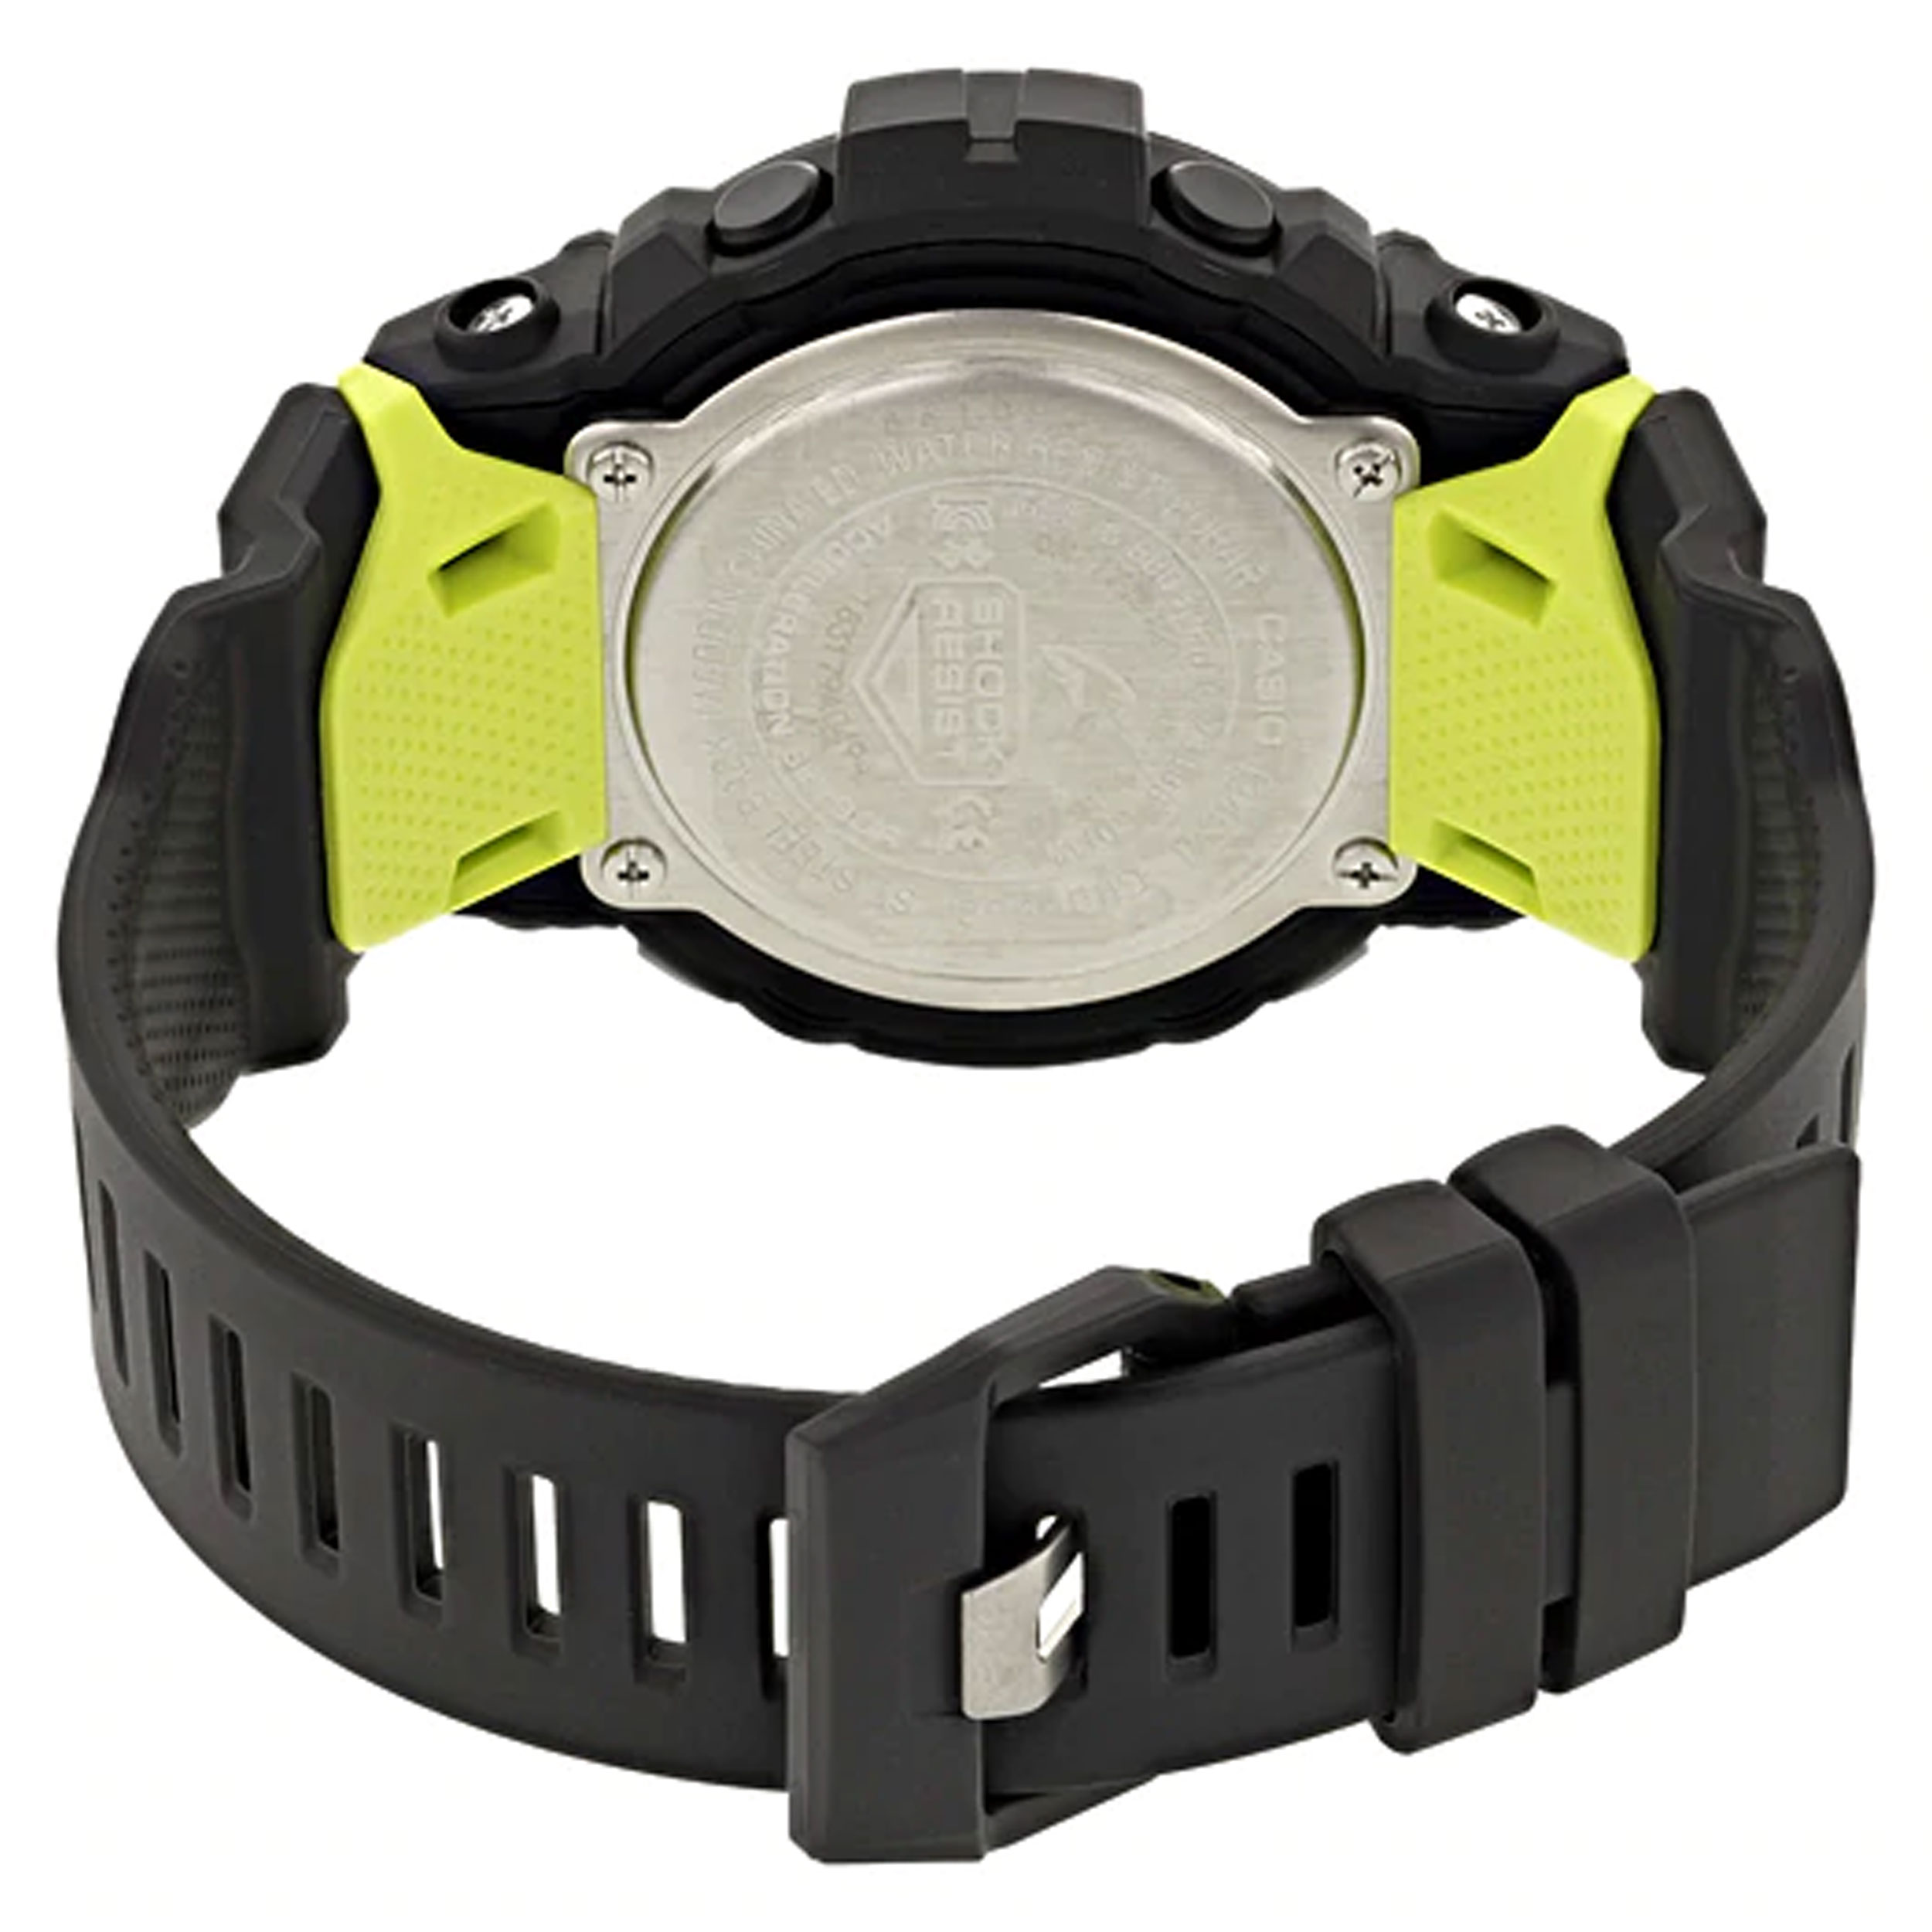 ساعت مچی دیجیتال مردانه کاسیو مدل GBD-800-8DR             قیمت